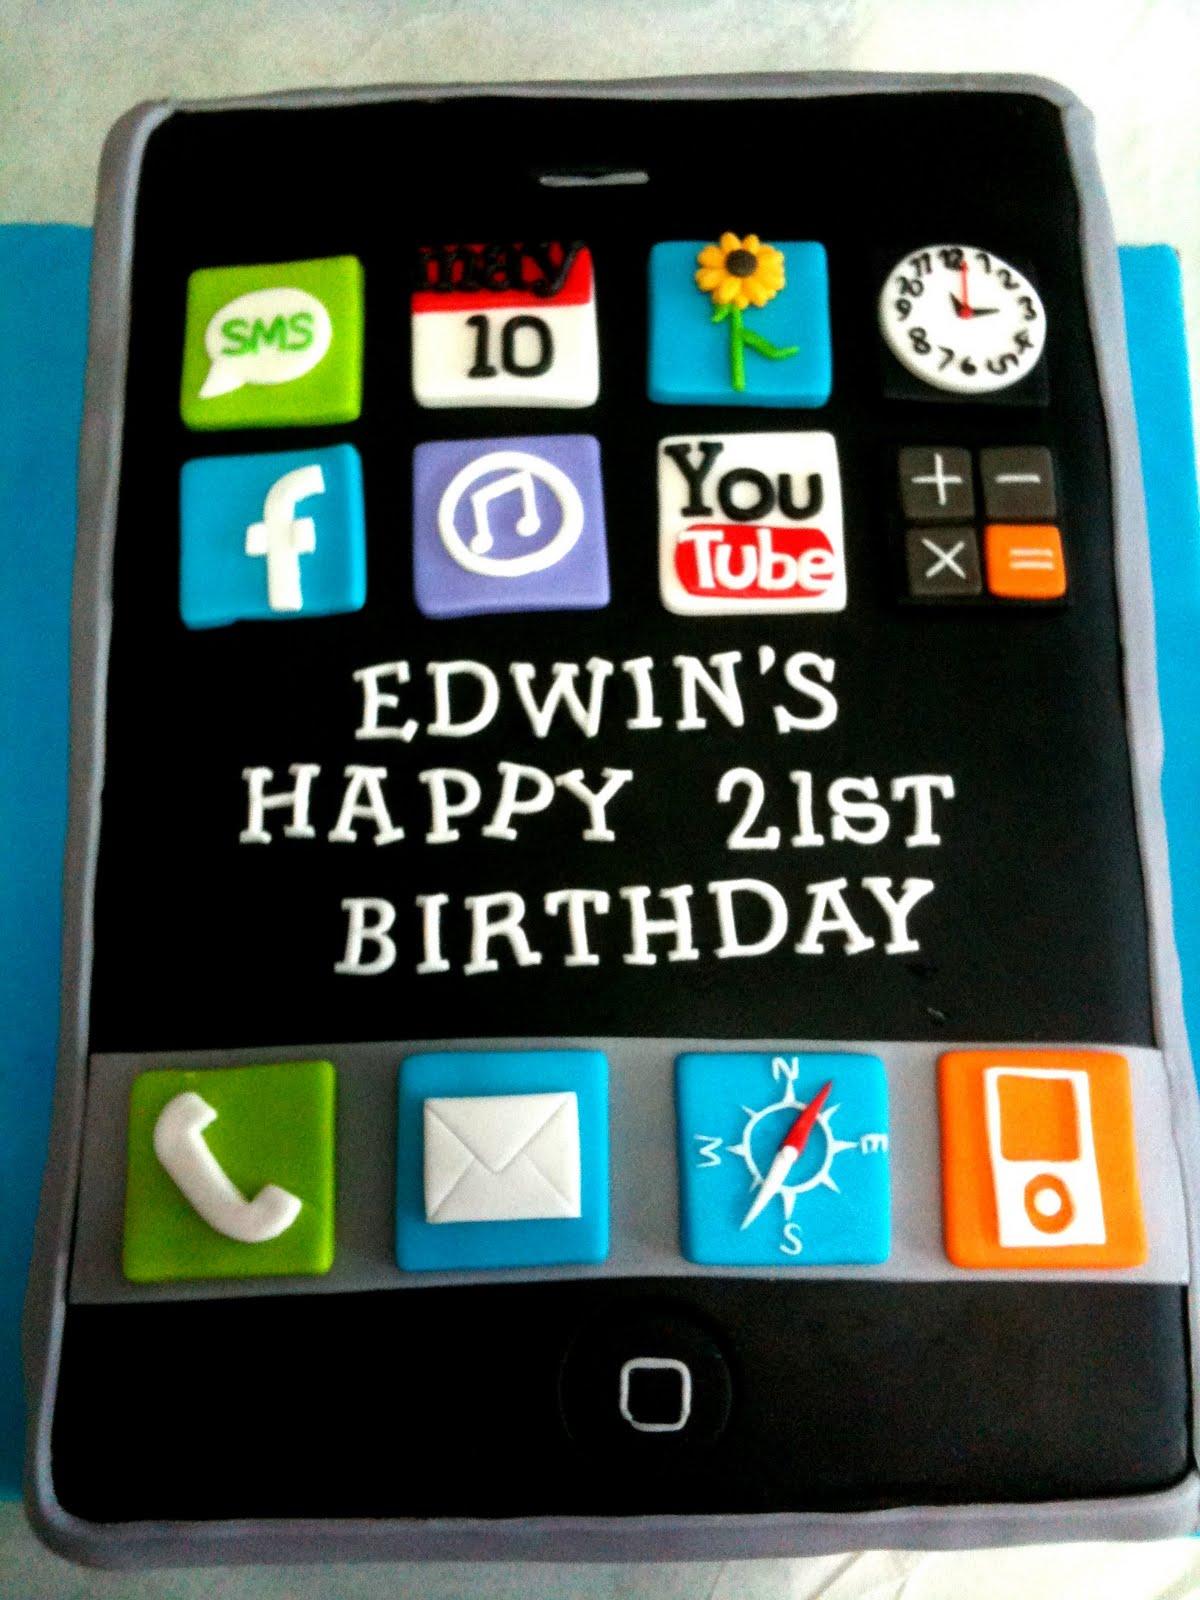 Oven Creations Happy 21st Birthday Edwin